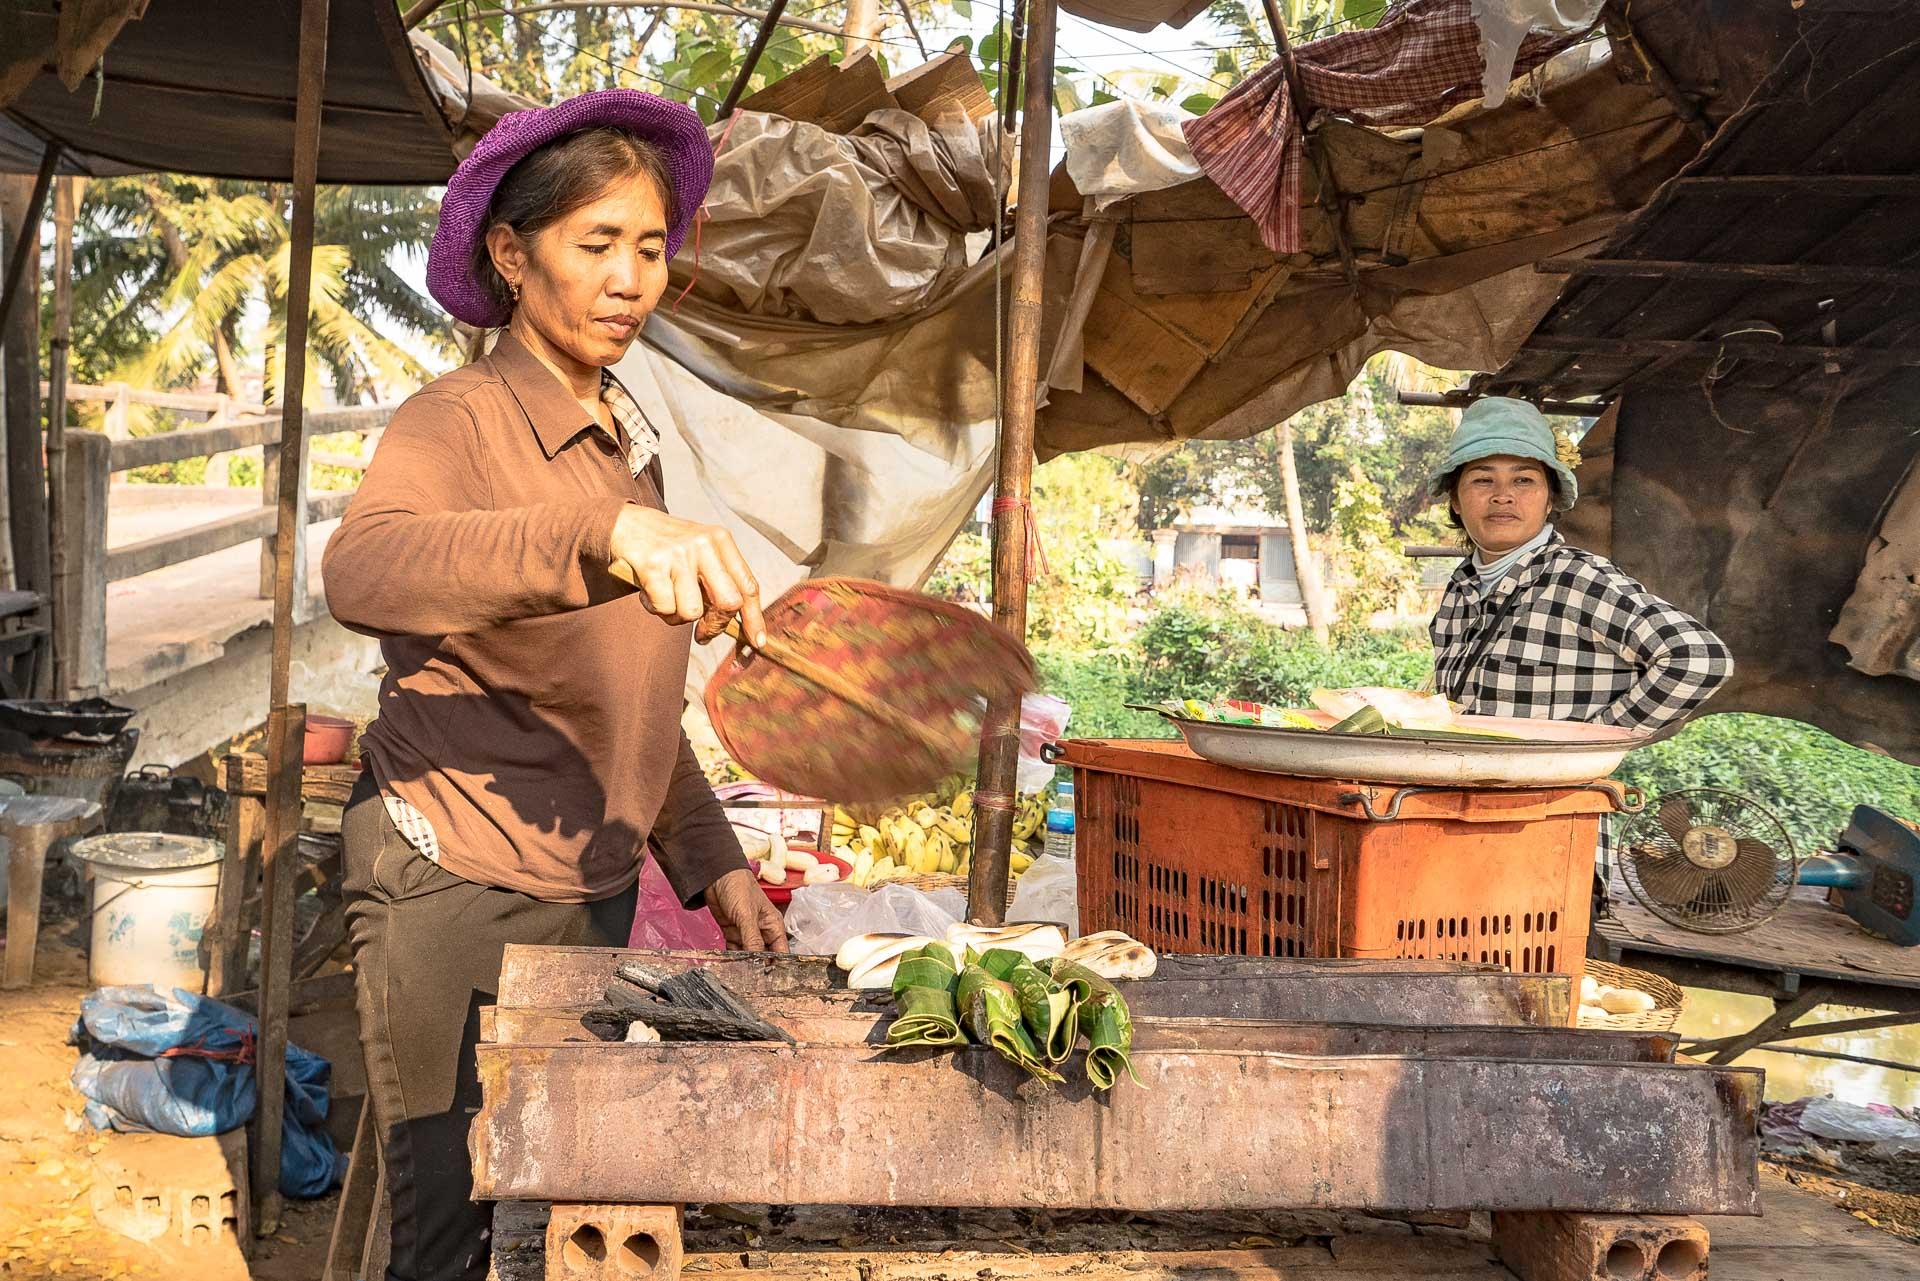 Lesvoyageuses-guide-voyage-siem-reap-angkor-cambodge-lavender-jeep-3